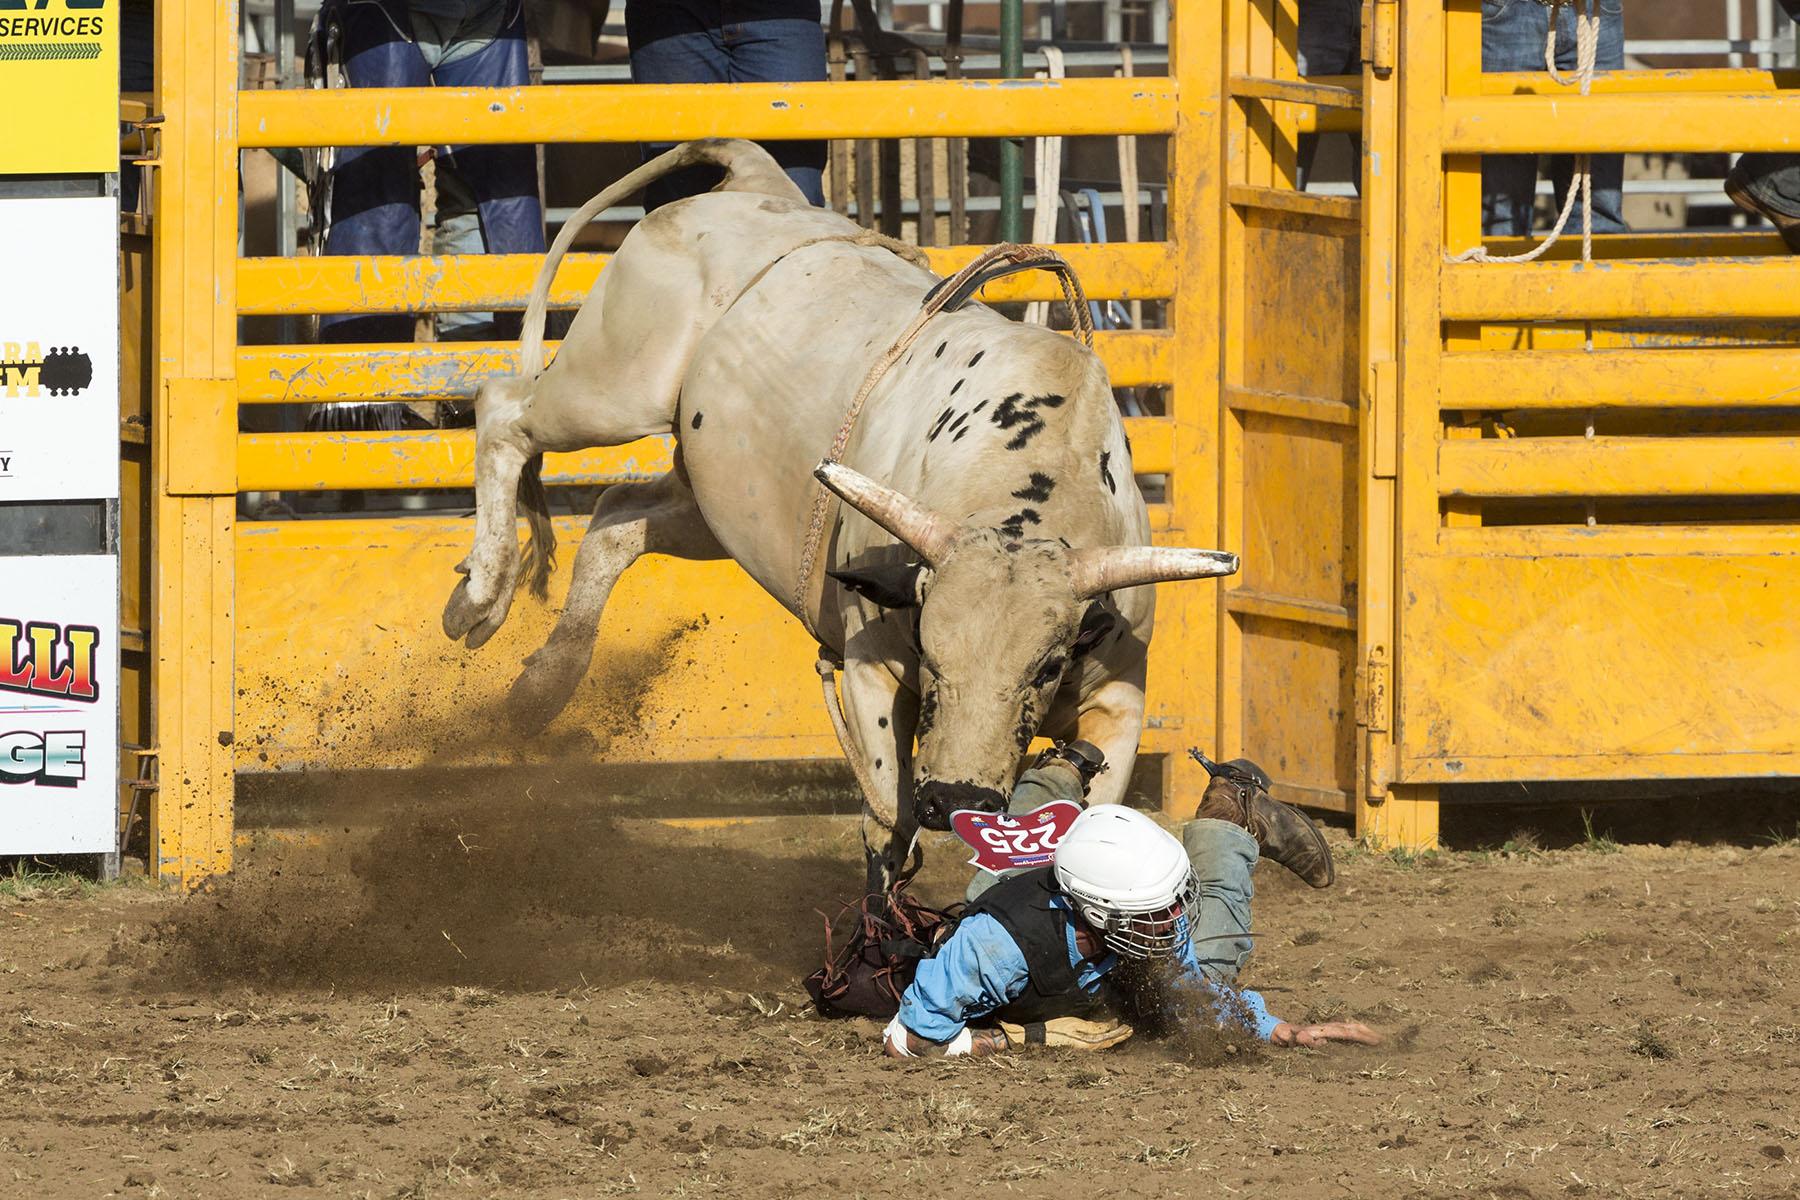 BrianJones_Rodeo Bull Riding_Bull Riding 5.jpg